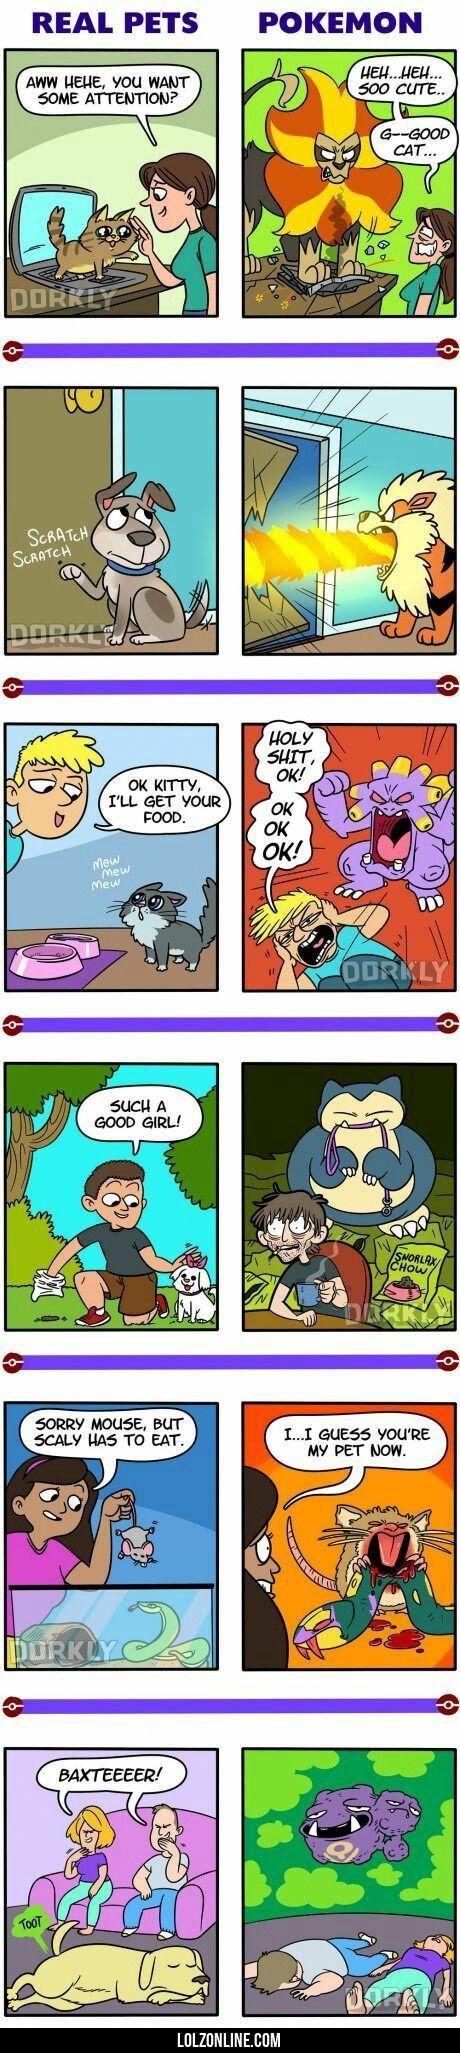 Real Pets Vs Pokemon#funny #lol #lolzonline